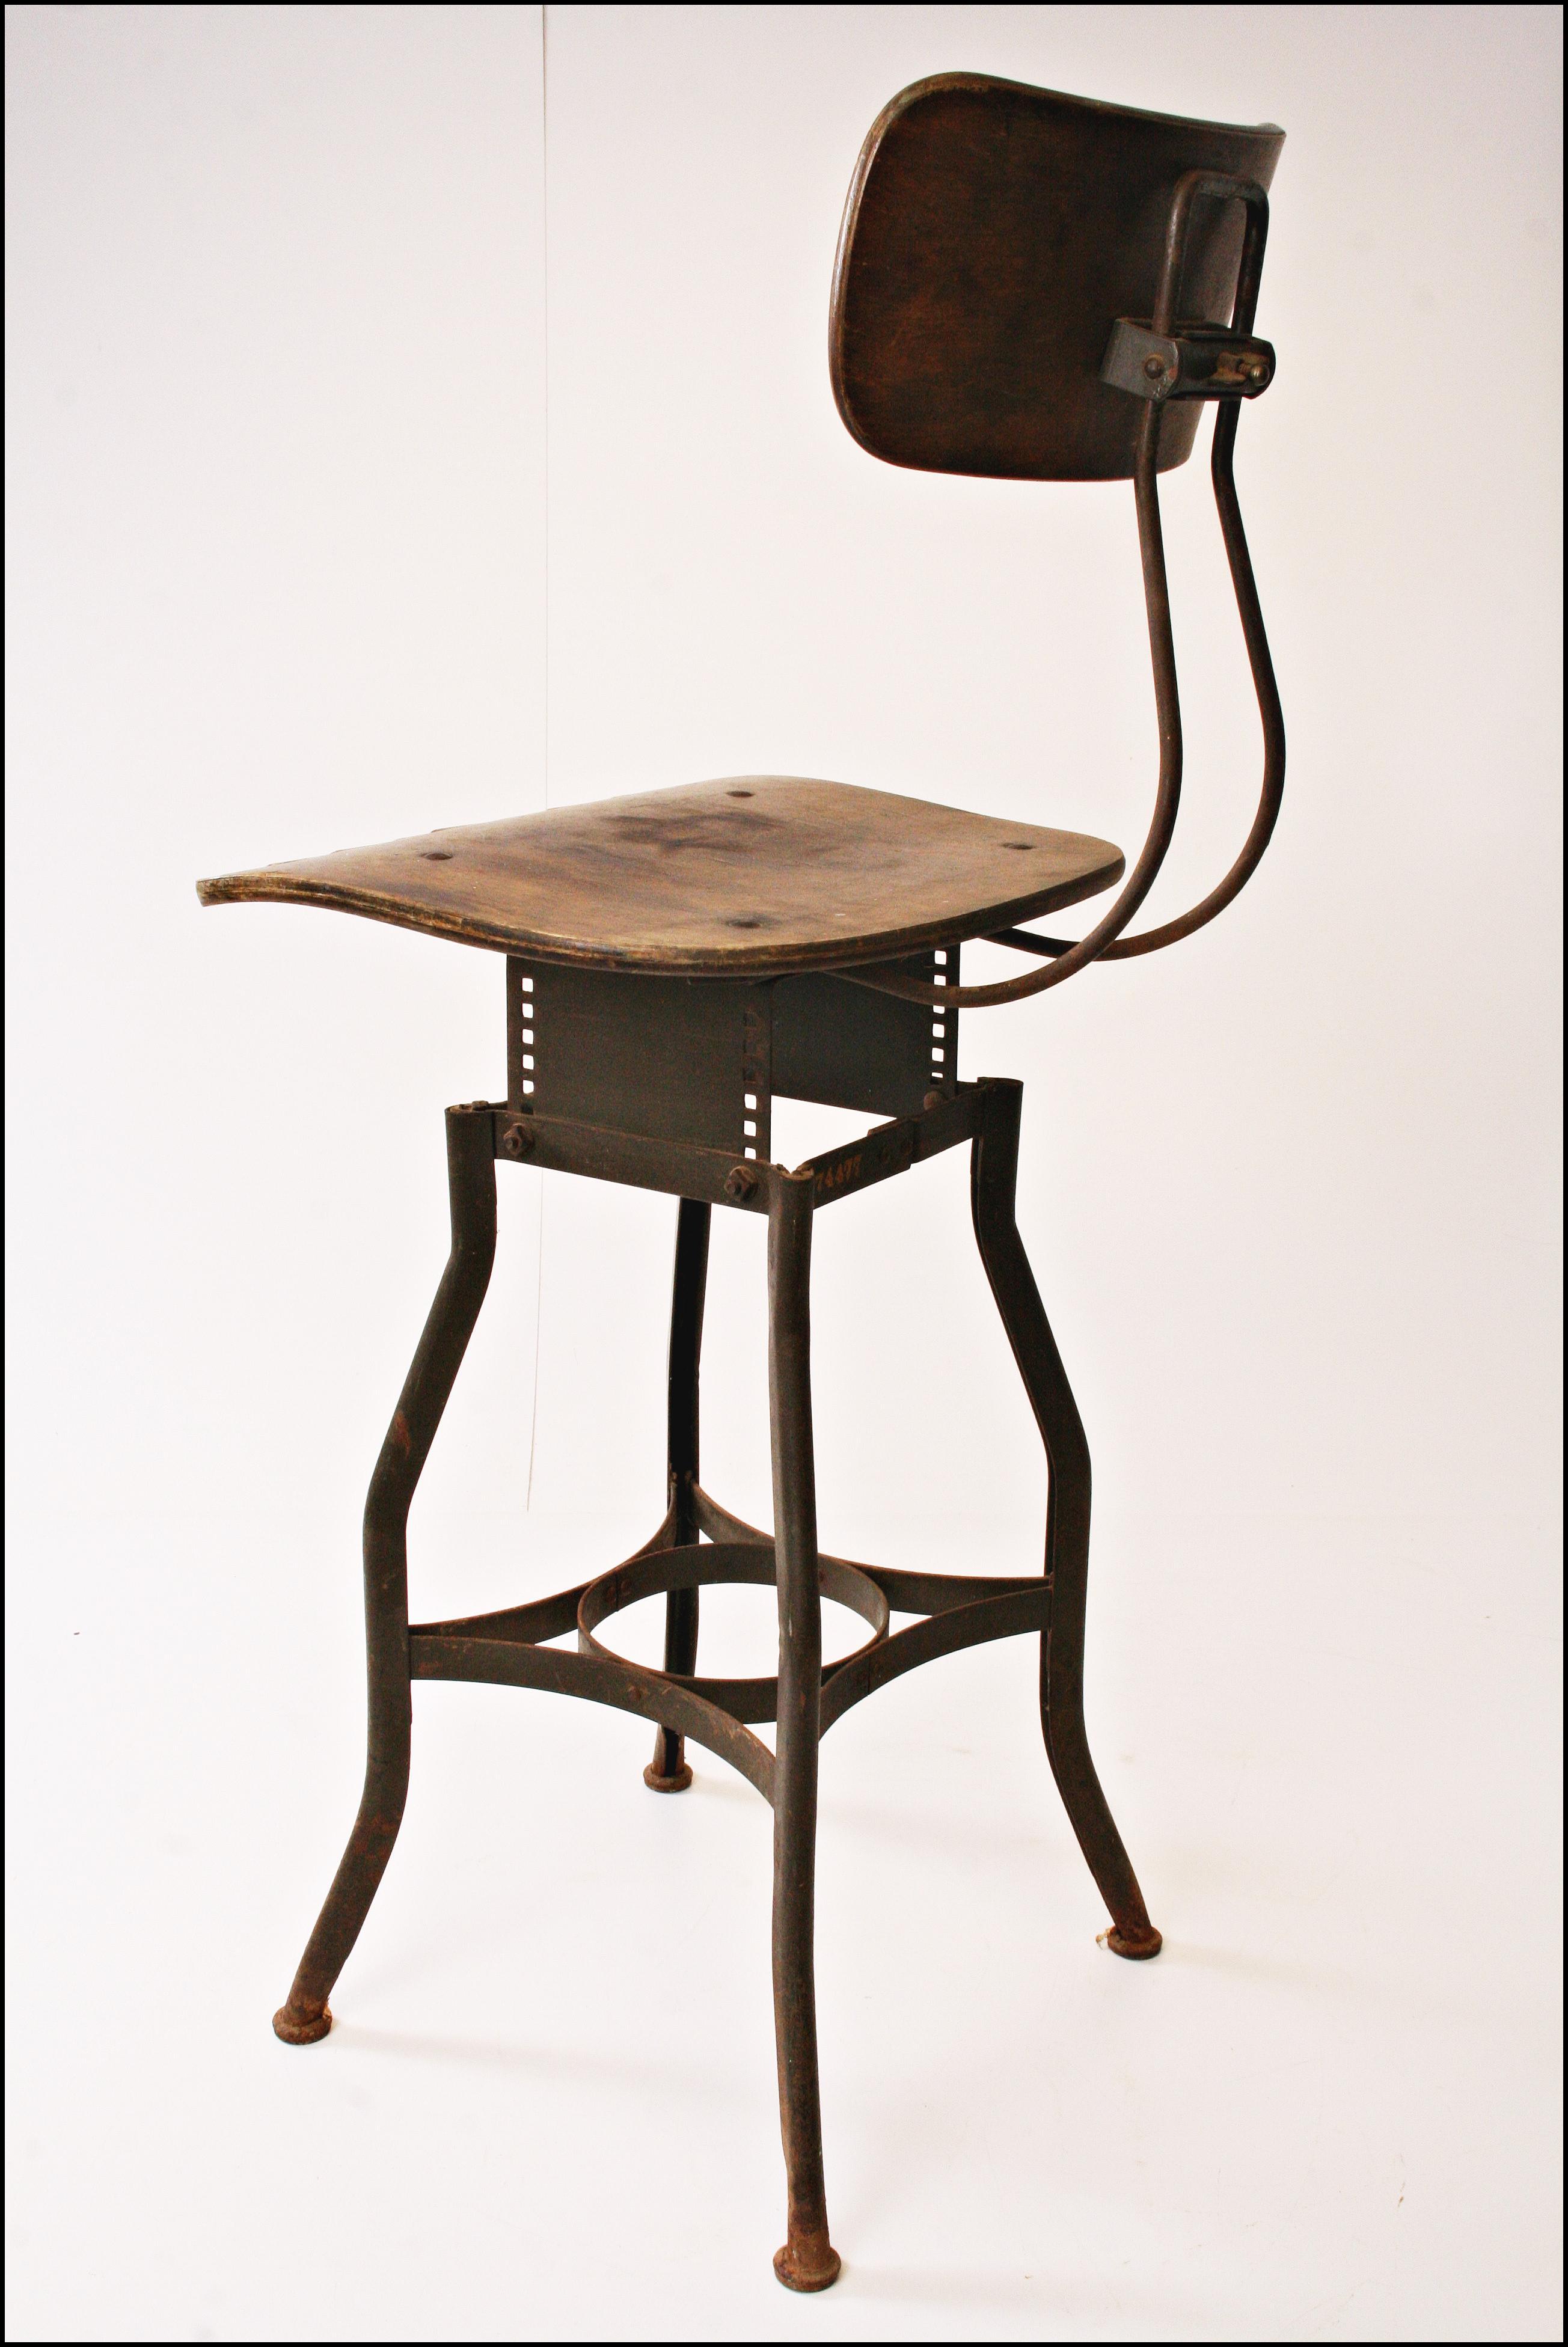 Vintage Toledo Industrial Drafting Stool Chairish : 93f3b447 c947 4979 866e bcfb5005eb2baspectfitampwidth640ampheight640 from www.chairish.com size 640 x 640 jpeg 27kB